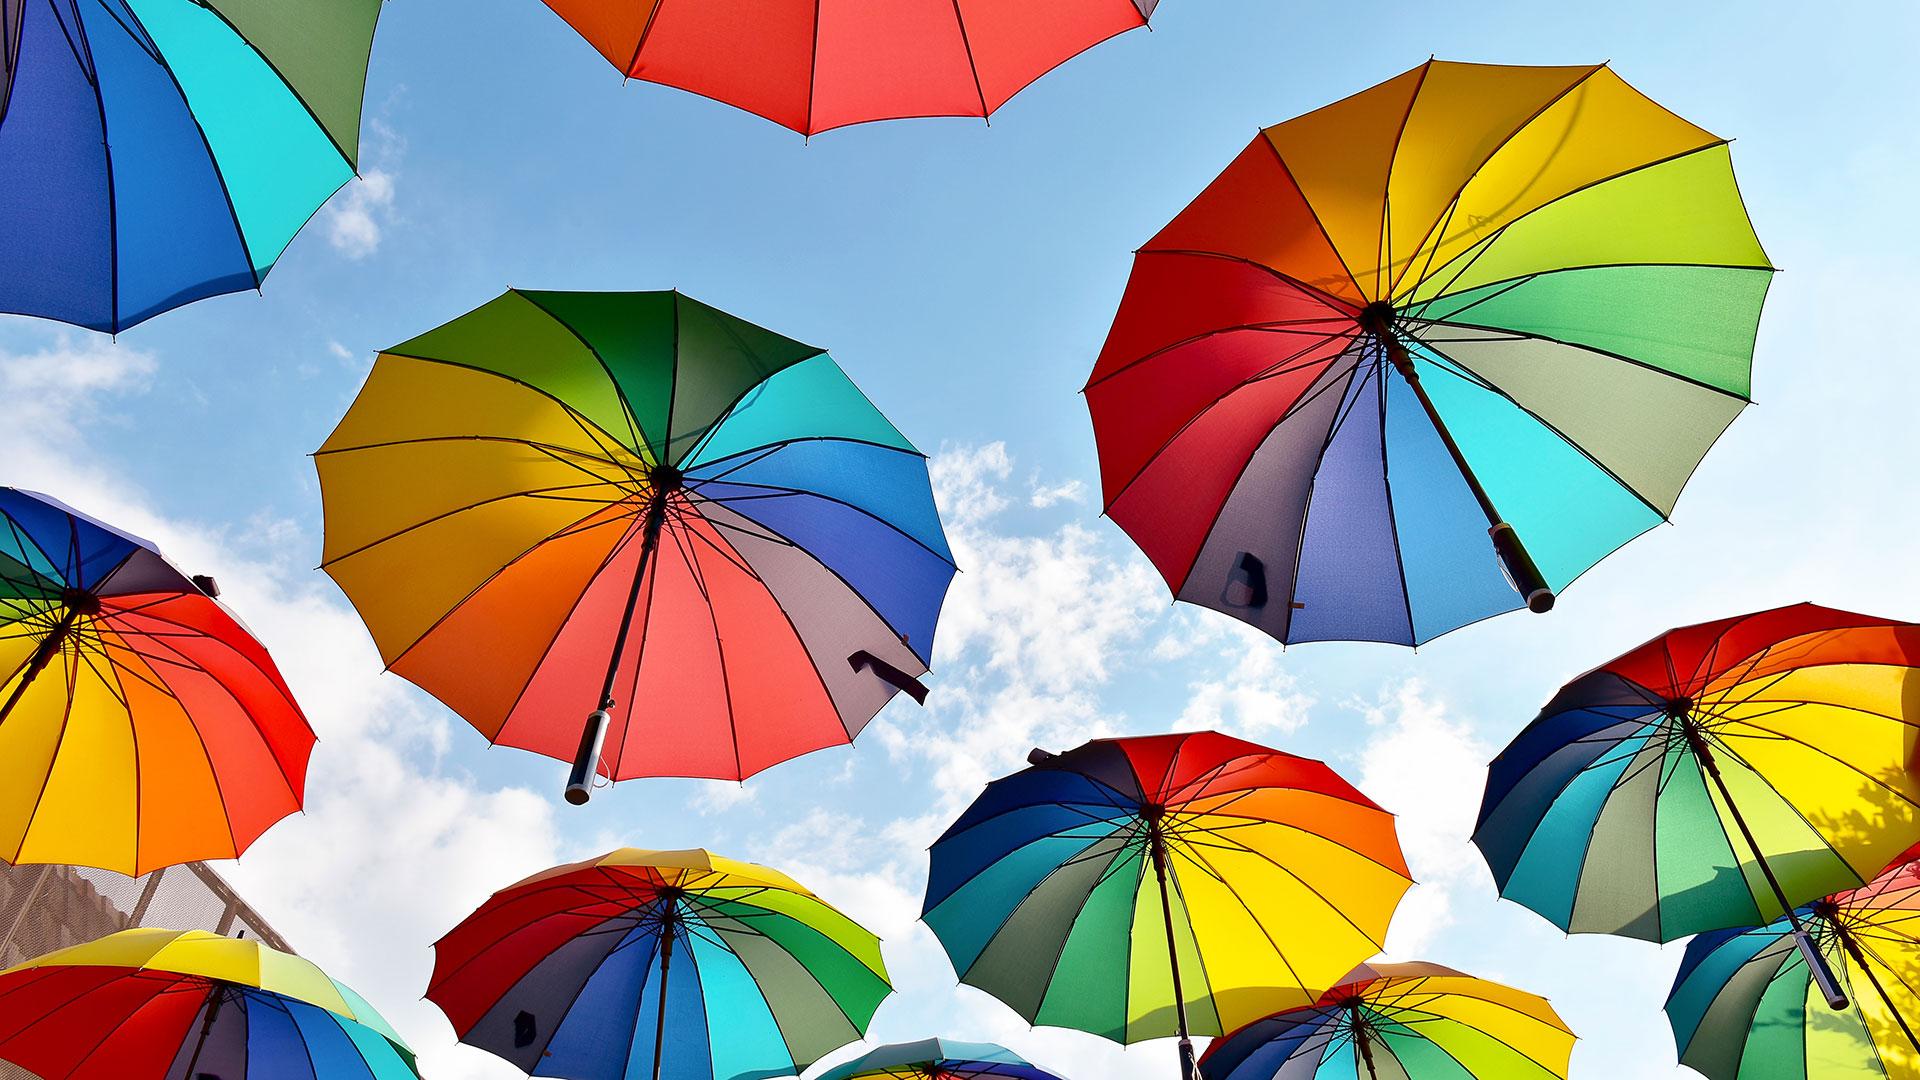 Rainbow coloured umbrellas in the sky